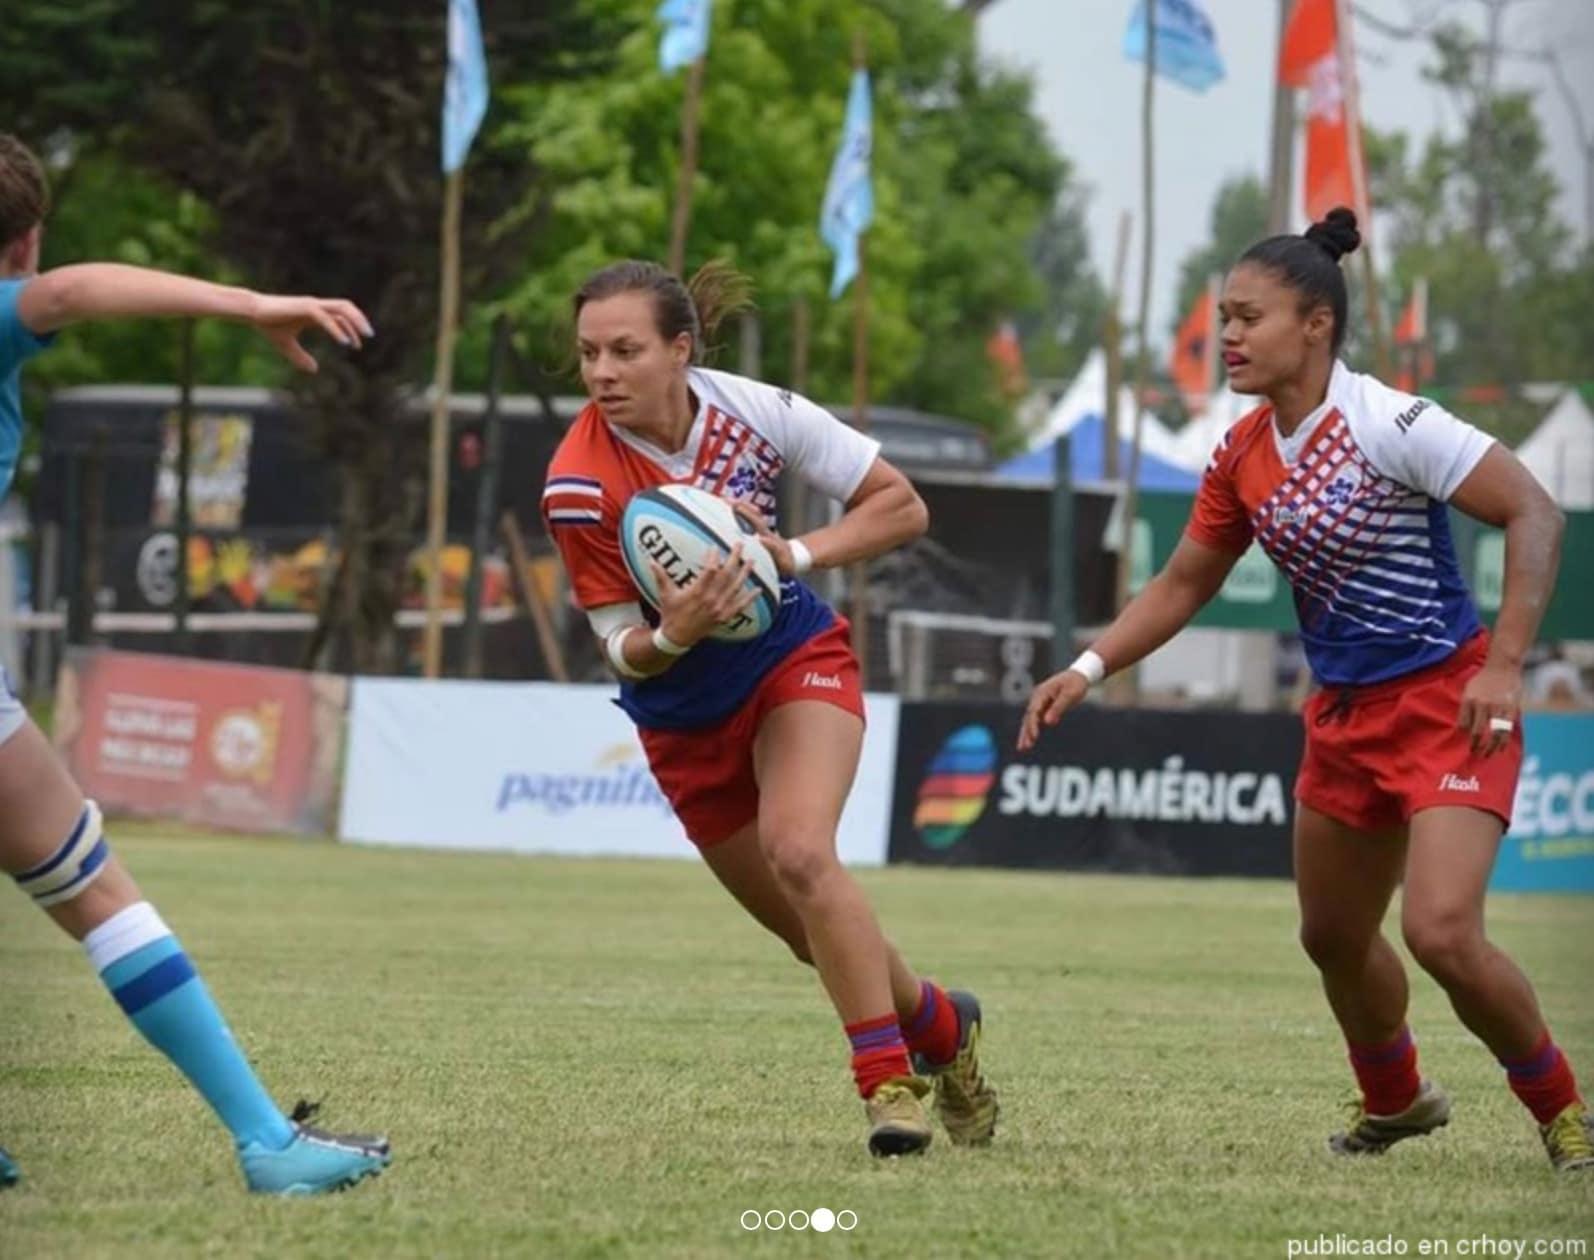 rugby-feminin-caroline-tigner-2-costa-rica-decouverte